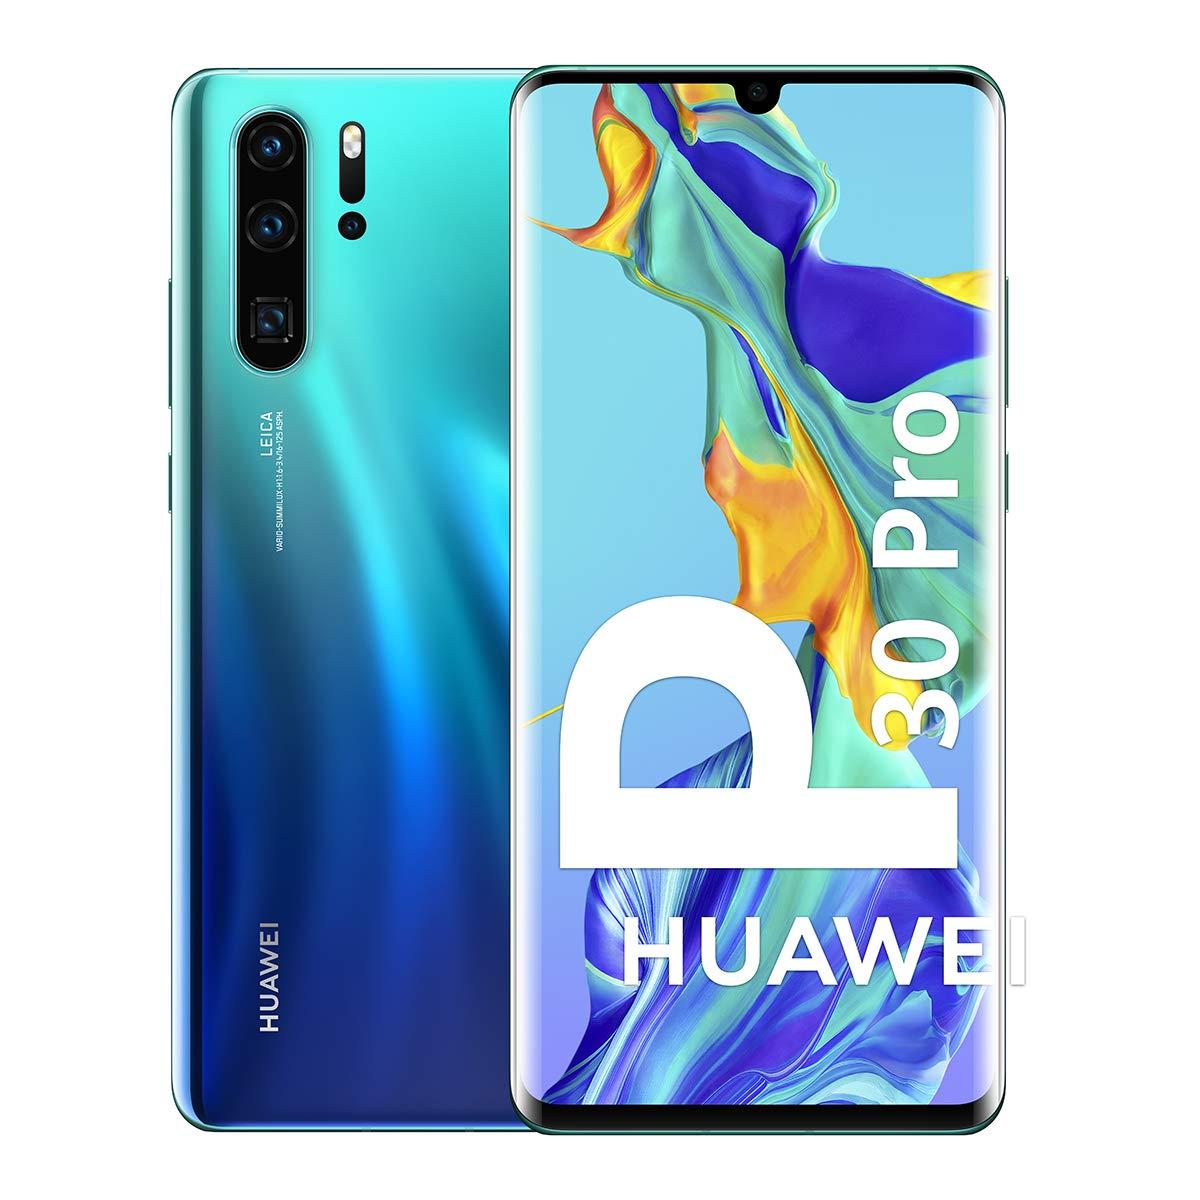 Huawei P30 Pro - Smartphone 128GB, 8GB RAM, Dual SIM, Aurora Blue